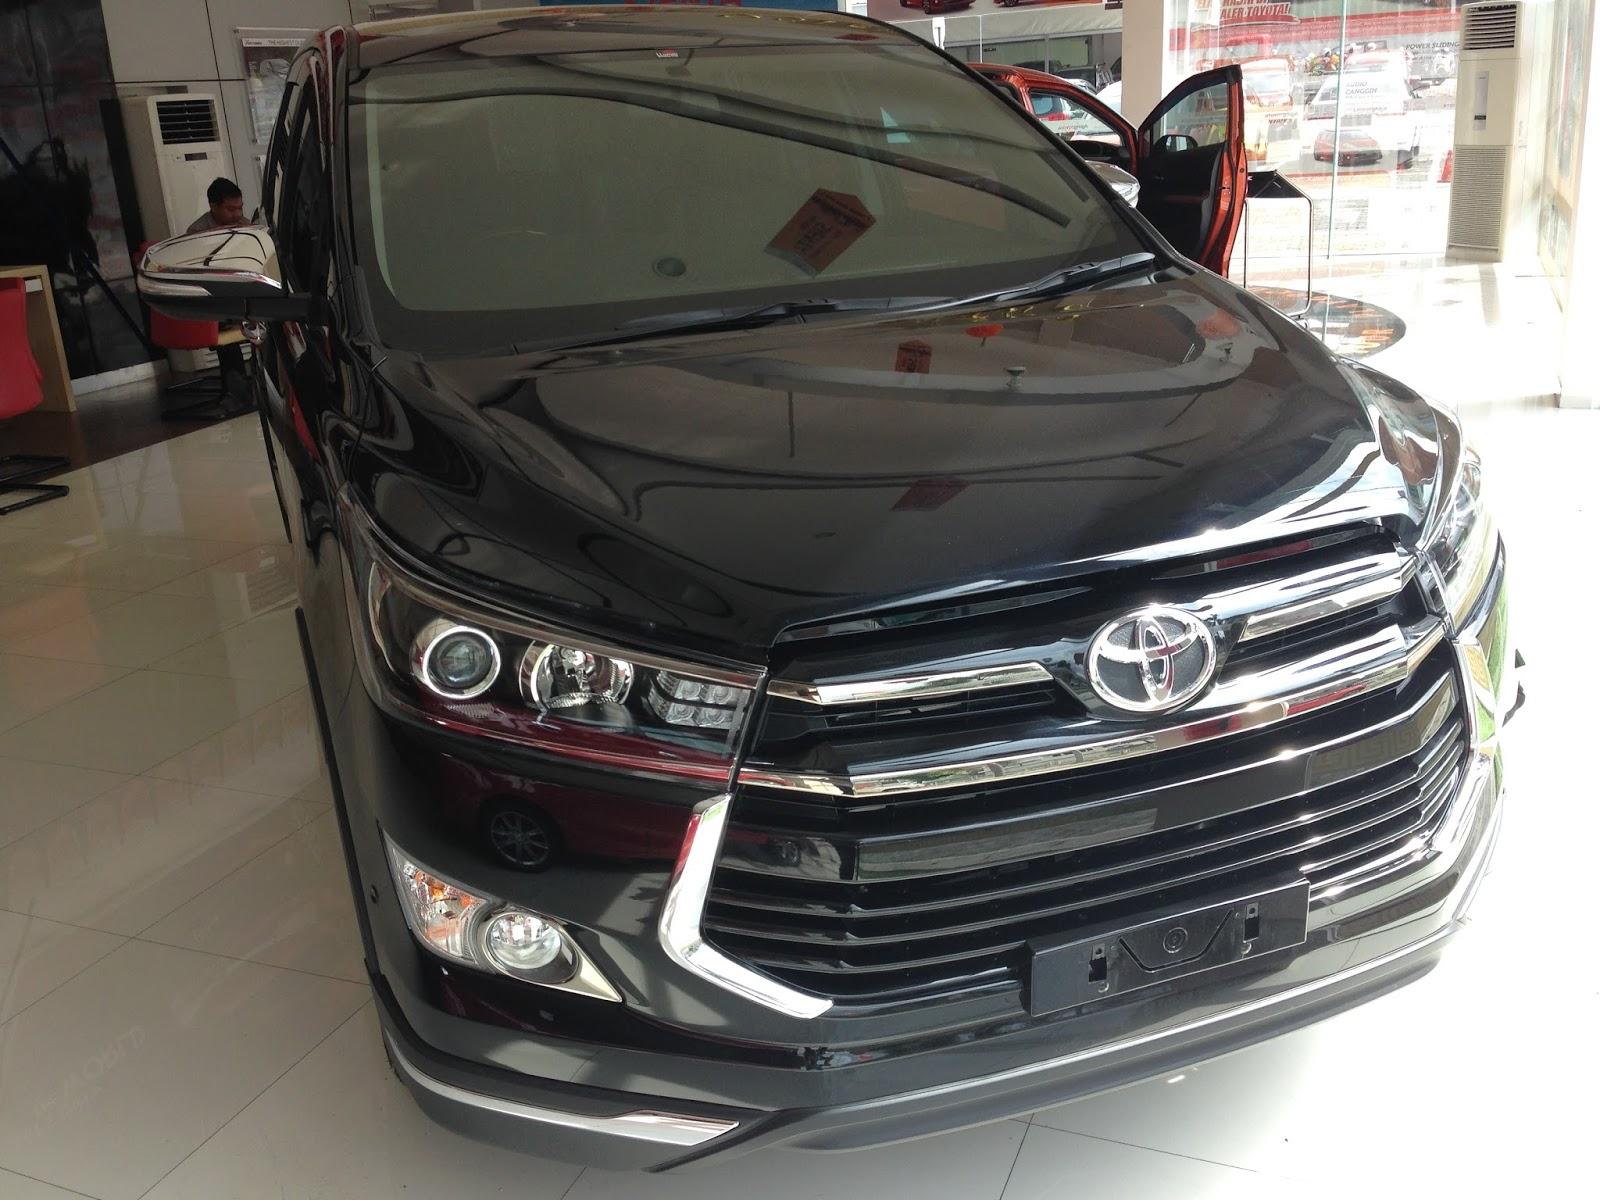 Spesifikasi New Innova Venturer Drl Grand Avanza Harga Toyota Dan 2017 Pekanbaru Riau